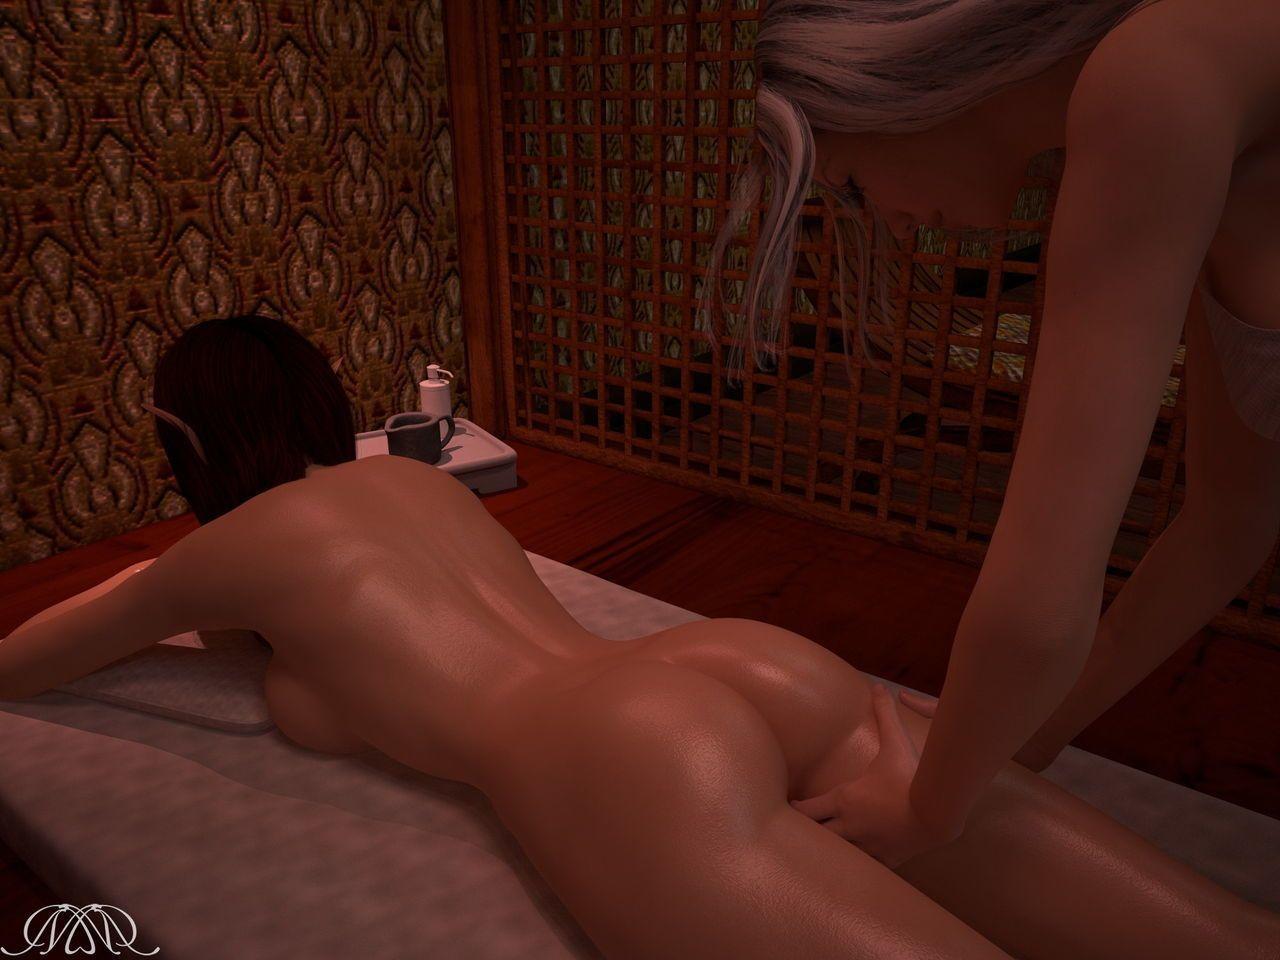 [Morfium] Afterwork Massage - part 6